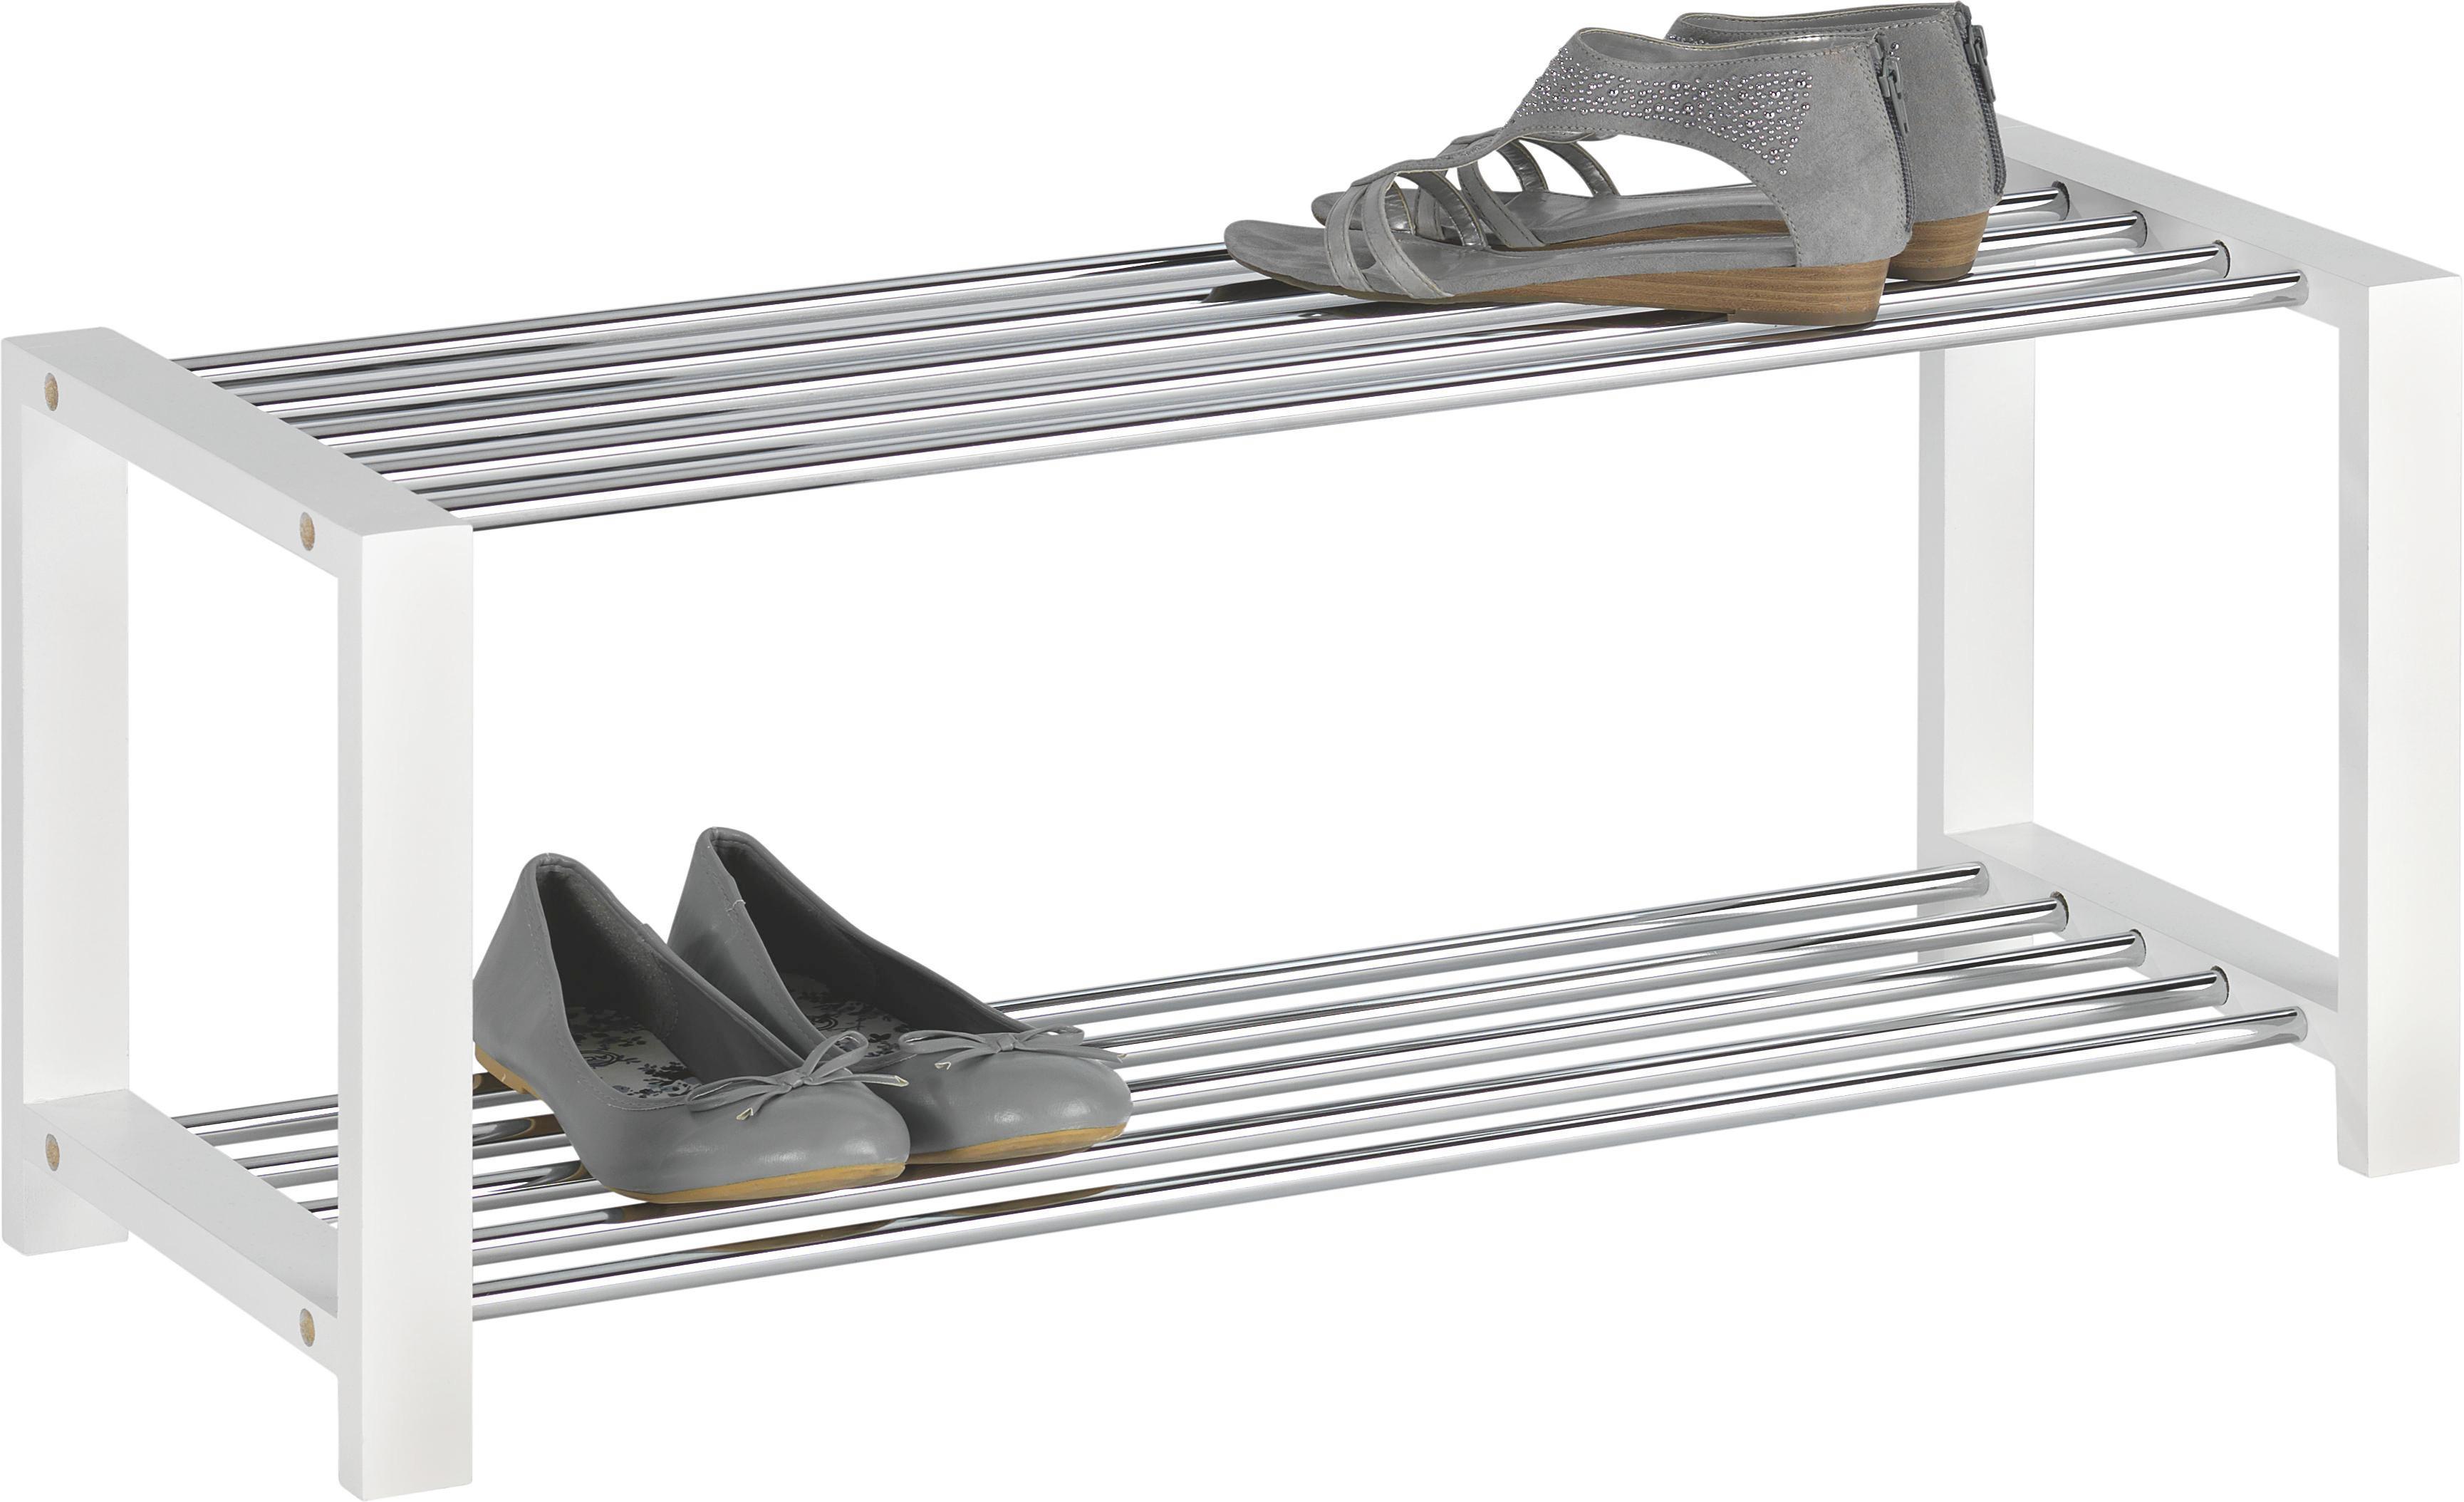 Schuhregale Metall schuhregal weiss affordable ikea schuhregale und schuhbnke wie z b